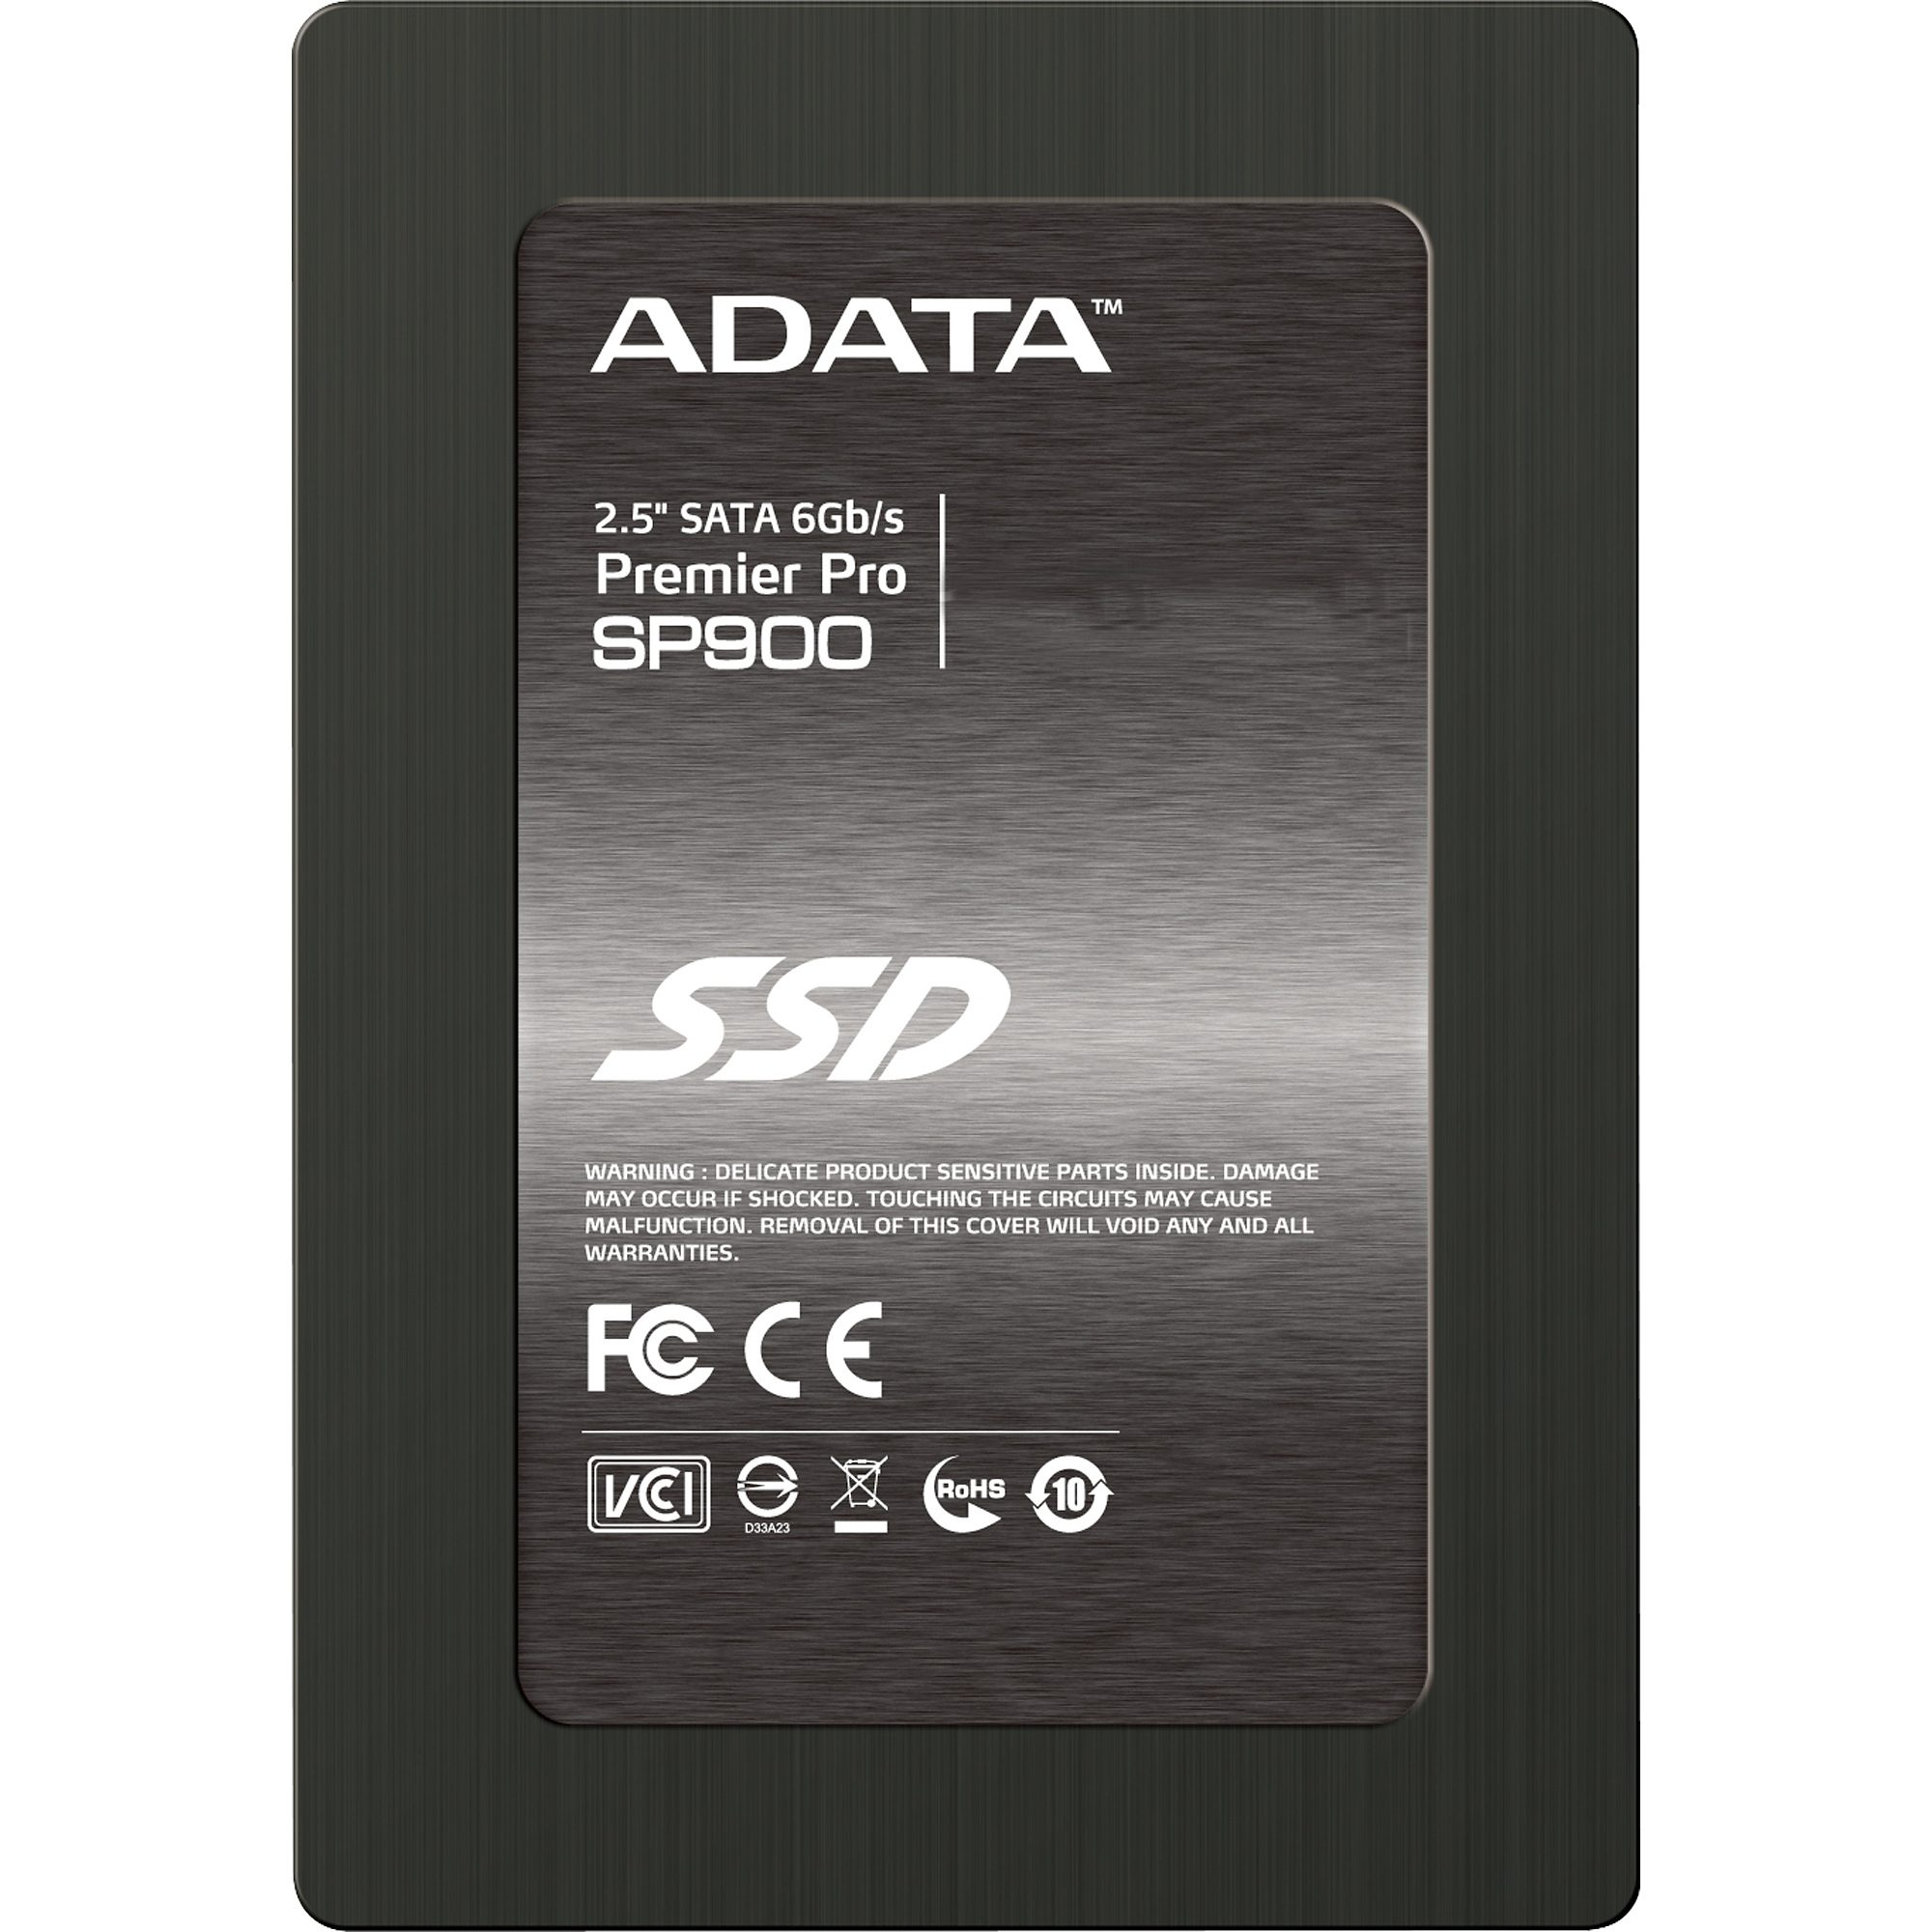 "ADATA Solid State Drive Premier Pro SP900 2,5"" SSD 256 GB"